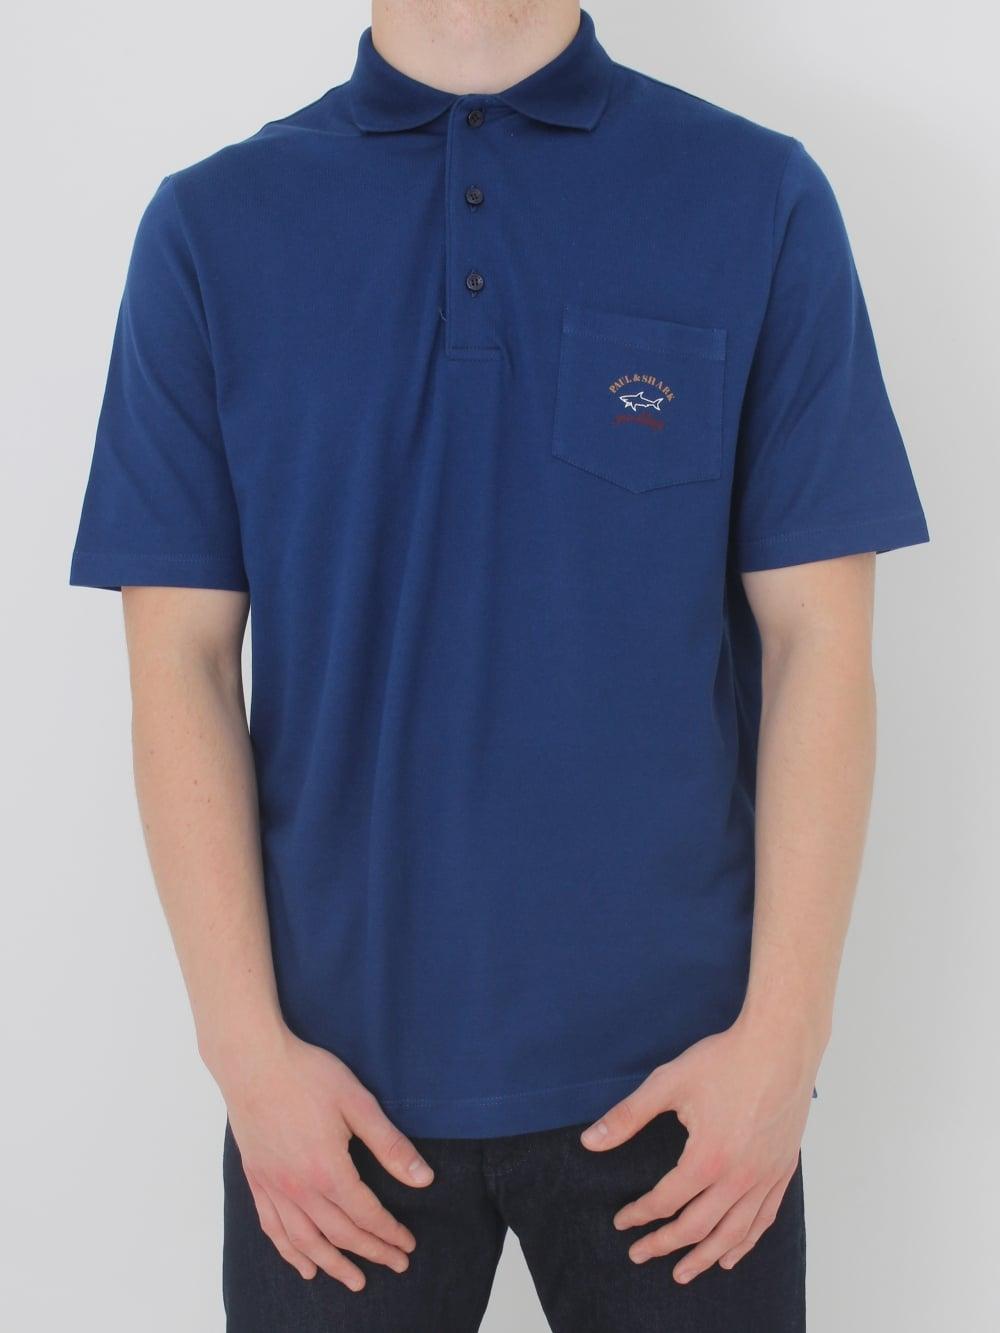 Paul   Shark Pocket Polo in Blue - Northern Threads ec7325cec960